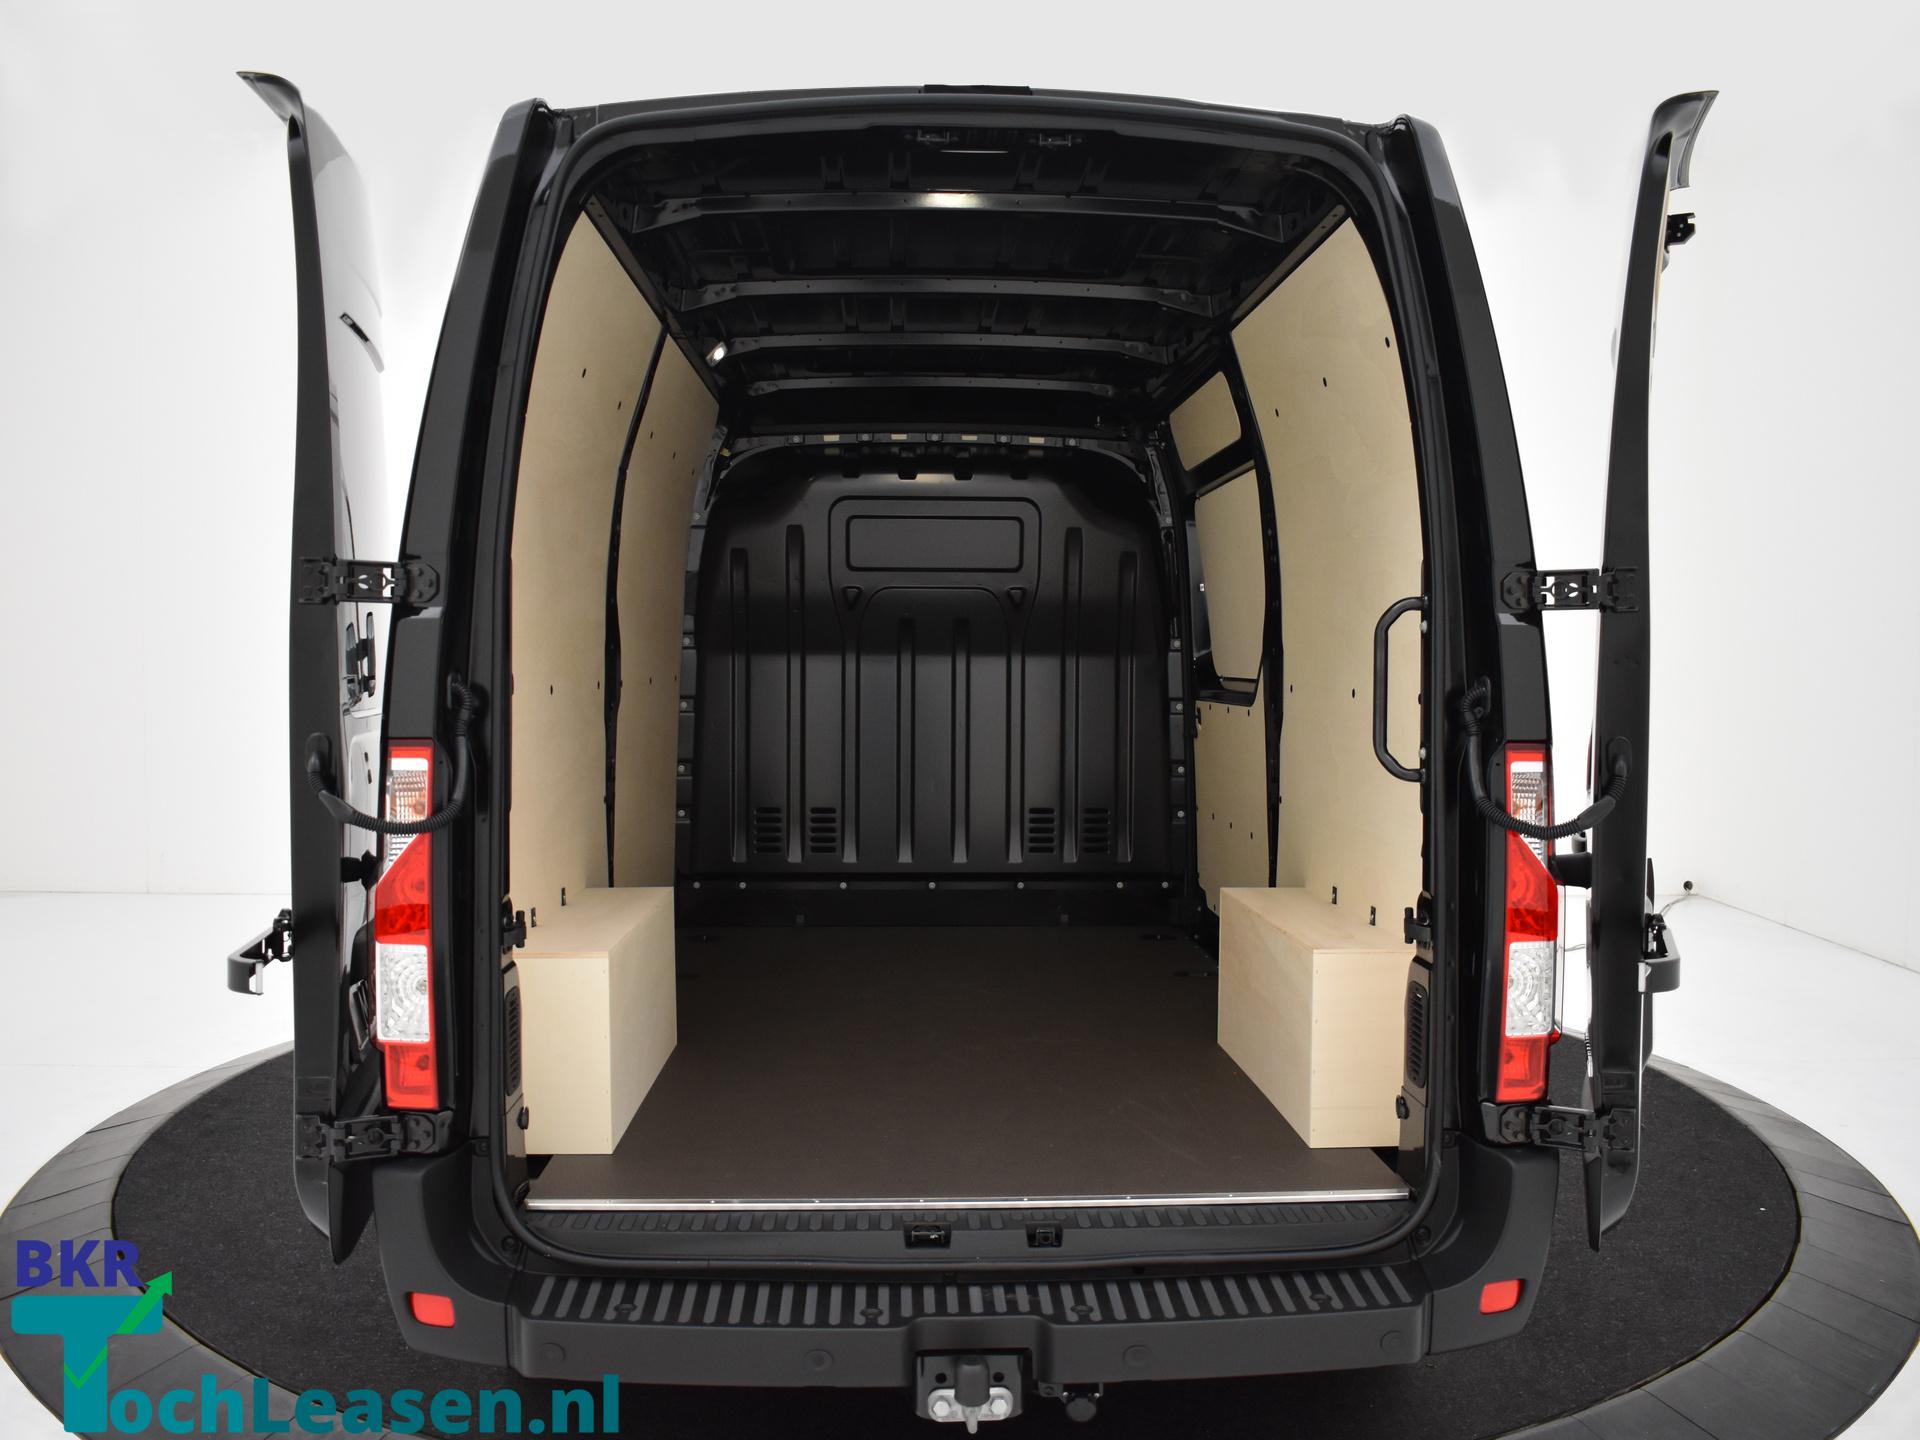 Renault Master L2H2 180 pk zwart achterkant open BKR toch Leasen